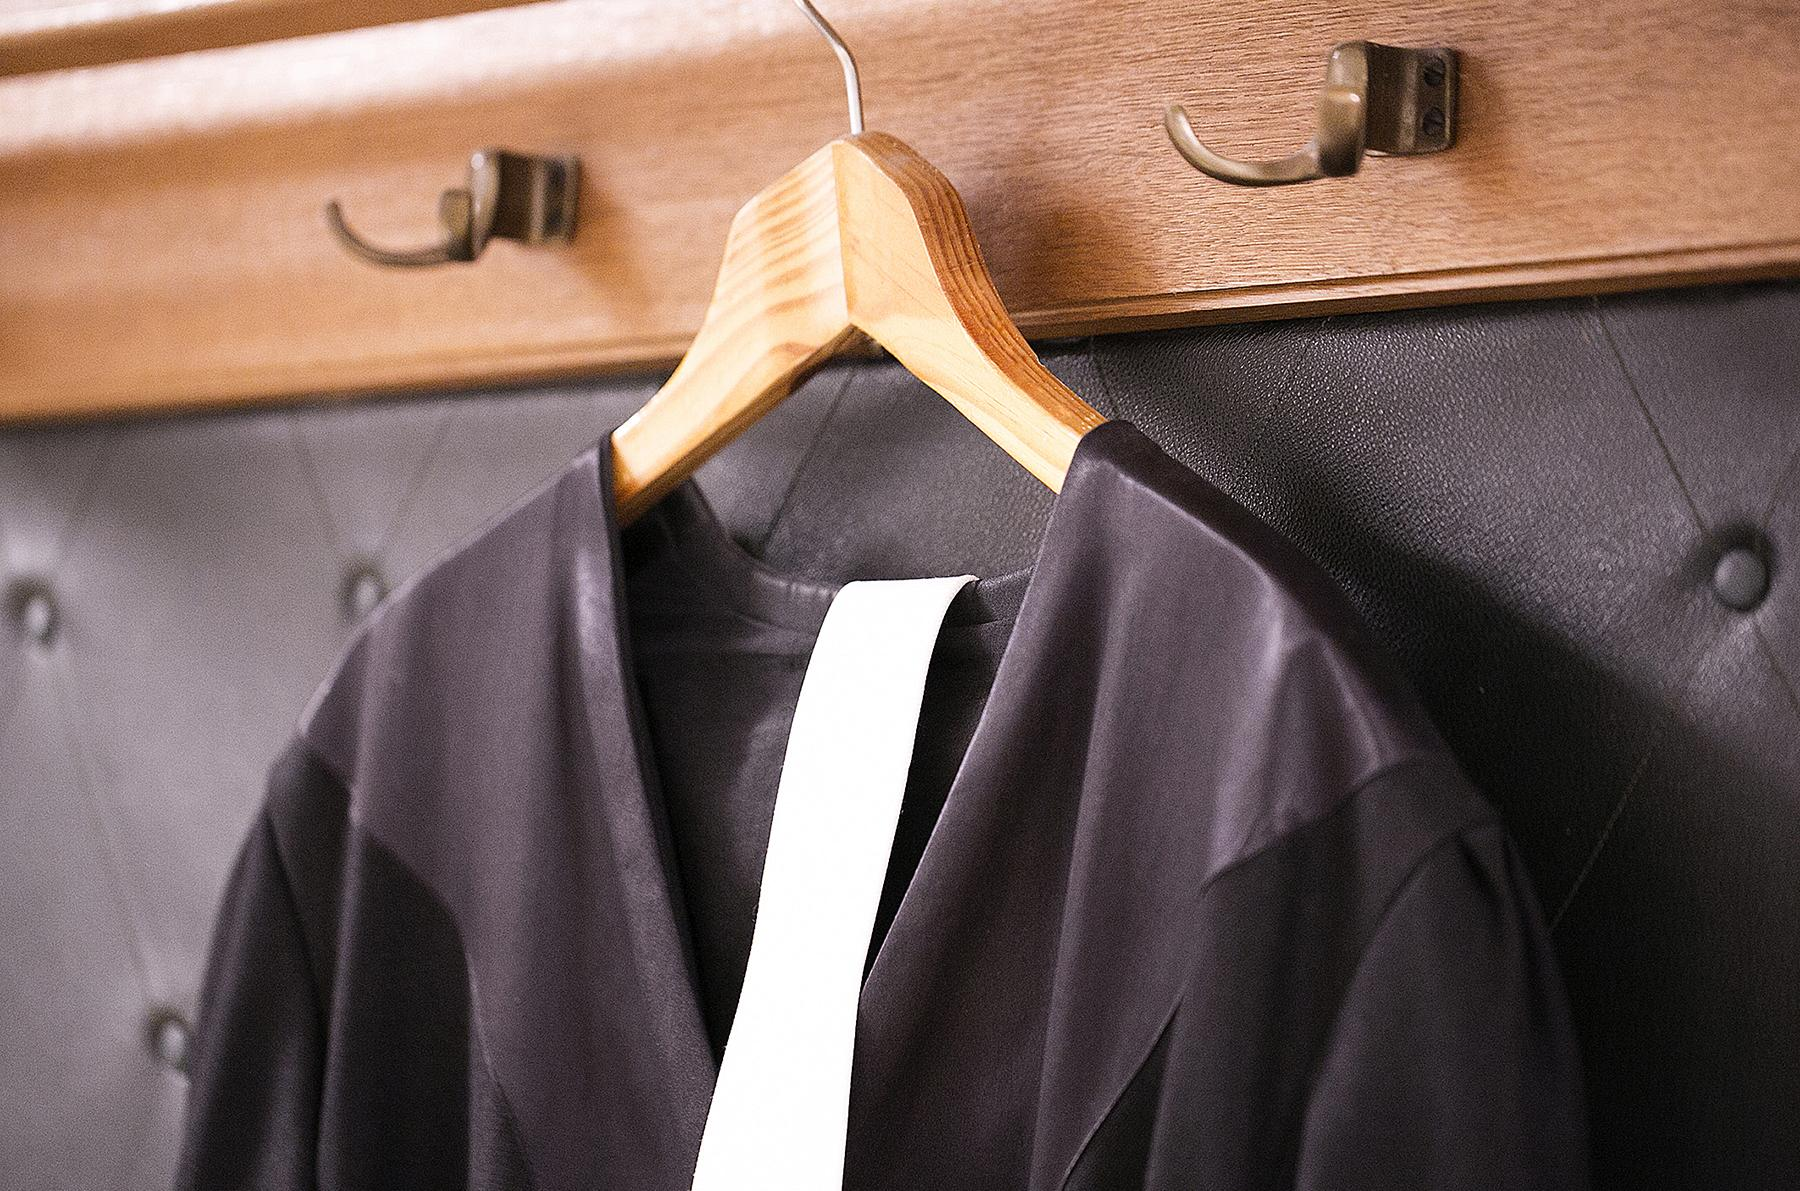 Anwaltsrobe_Gericht